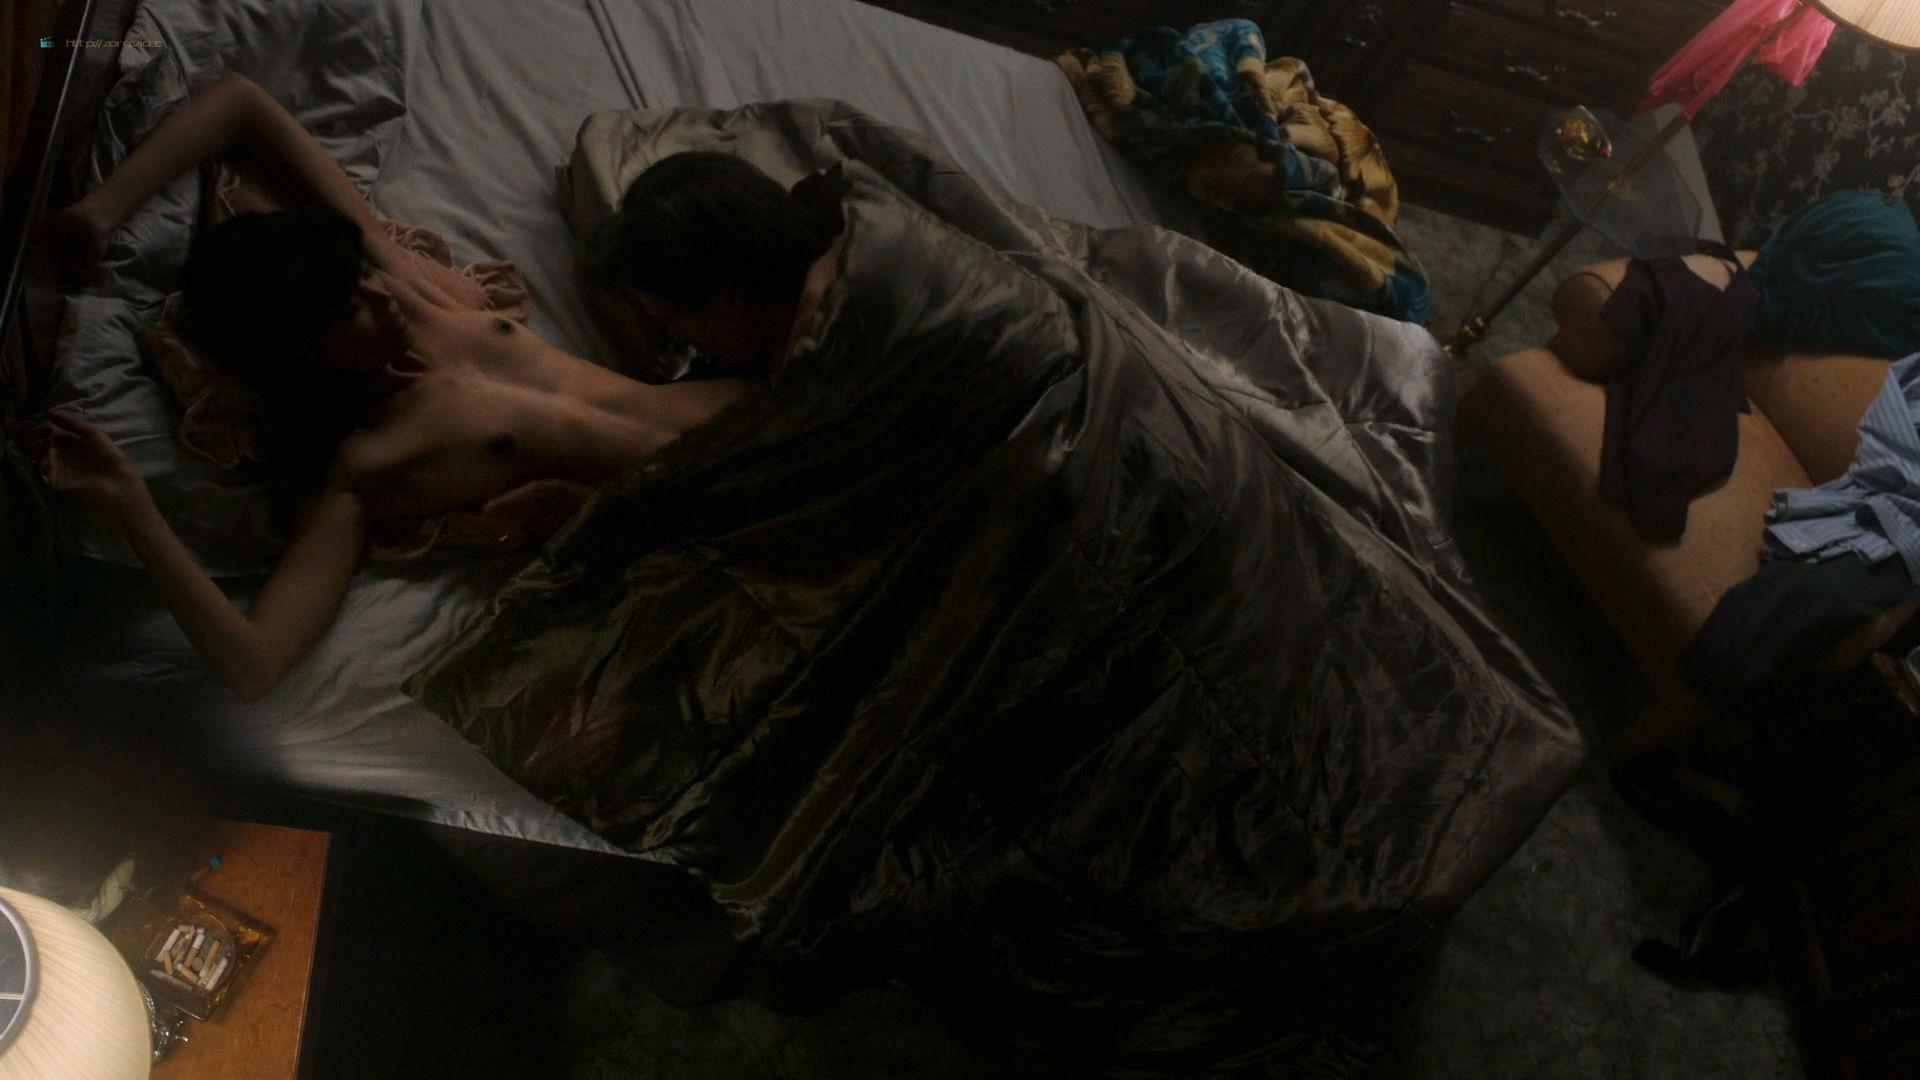 MaYaa Boateng nude topless in sex scene - City on a Hill (2019) s1e2 HD 1080p (6)